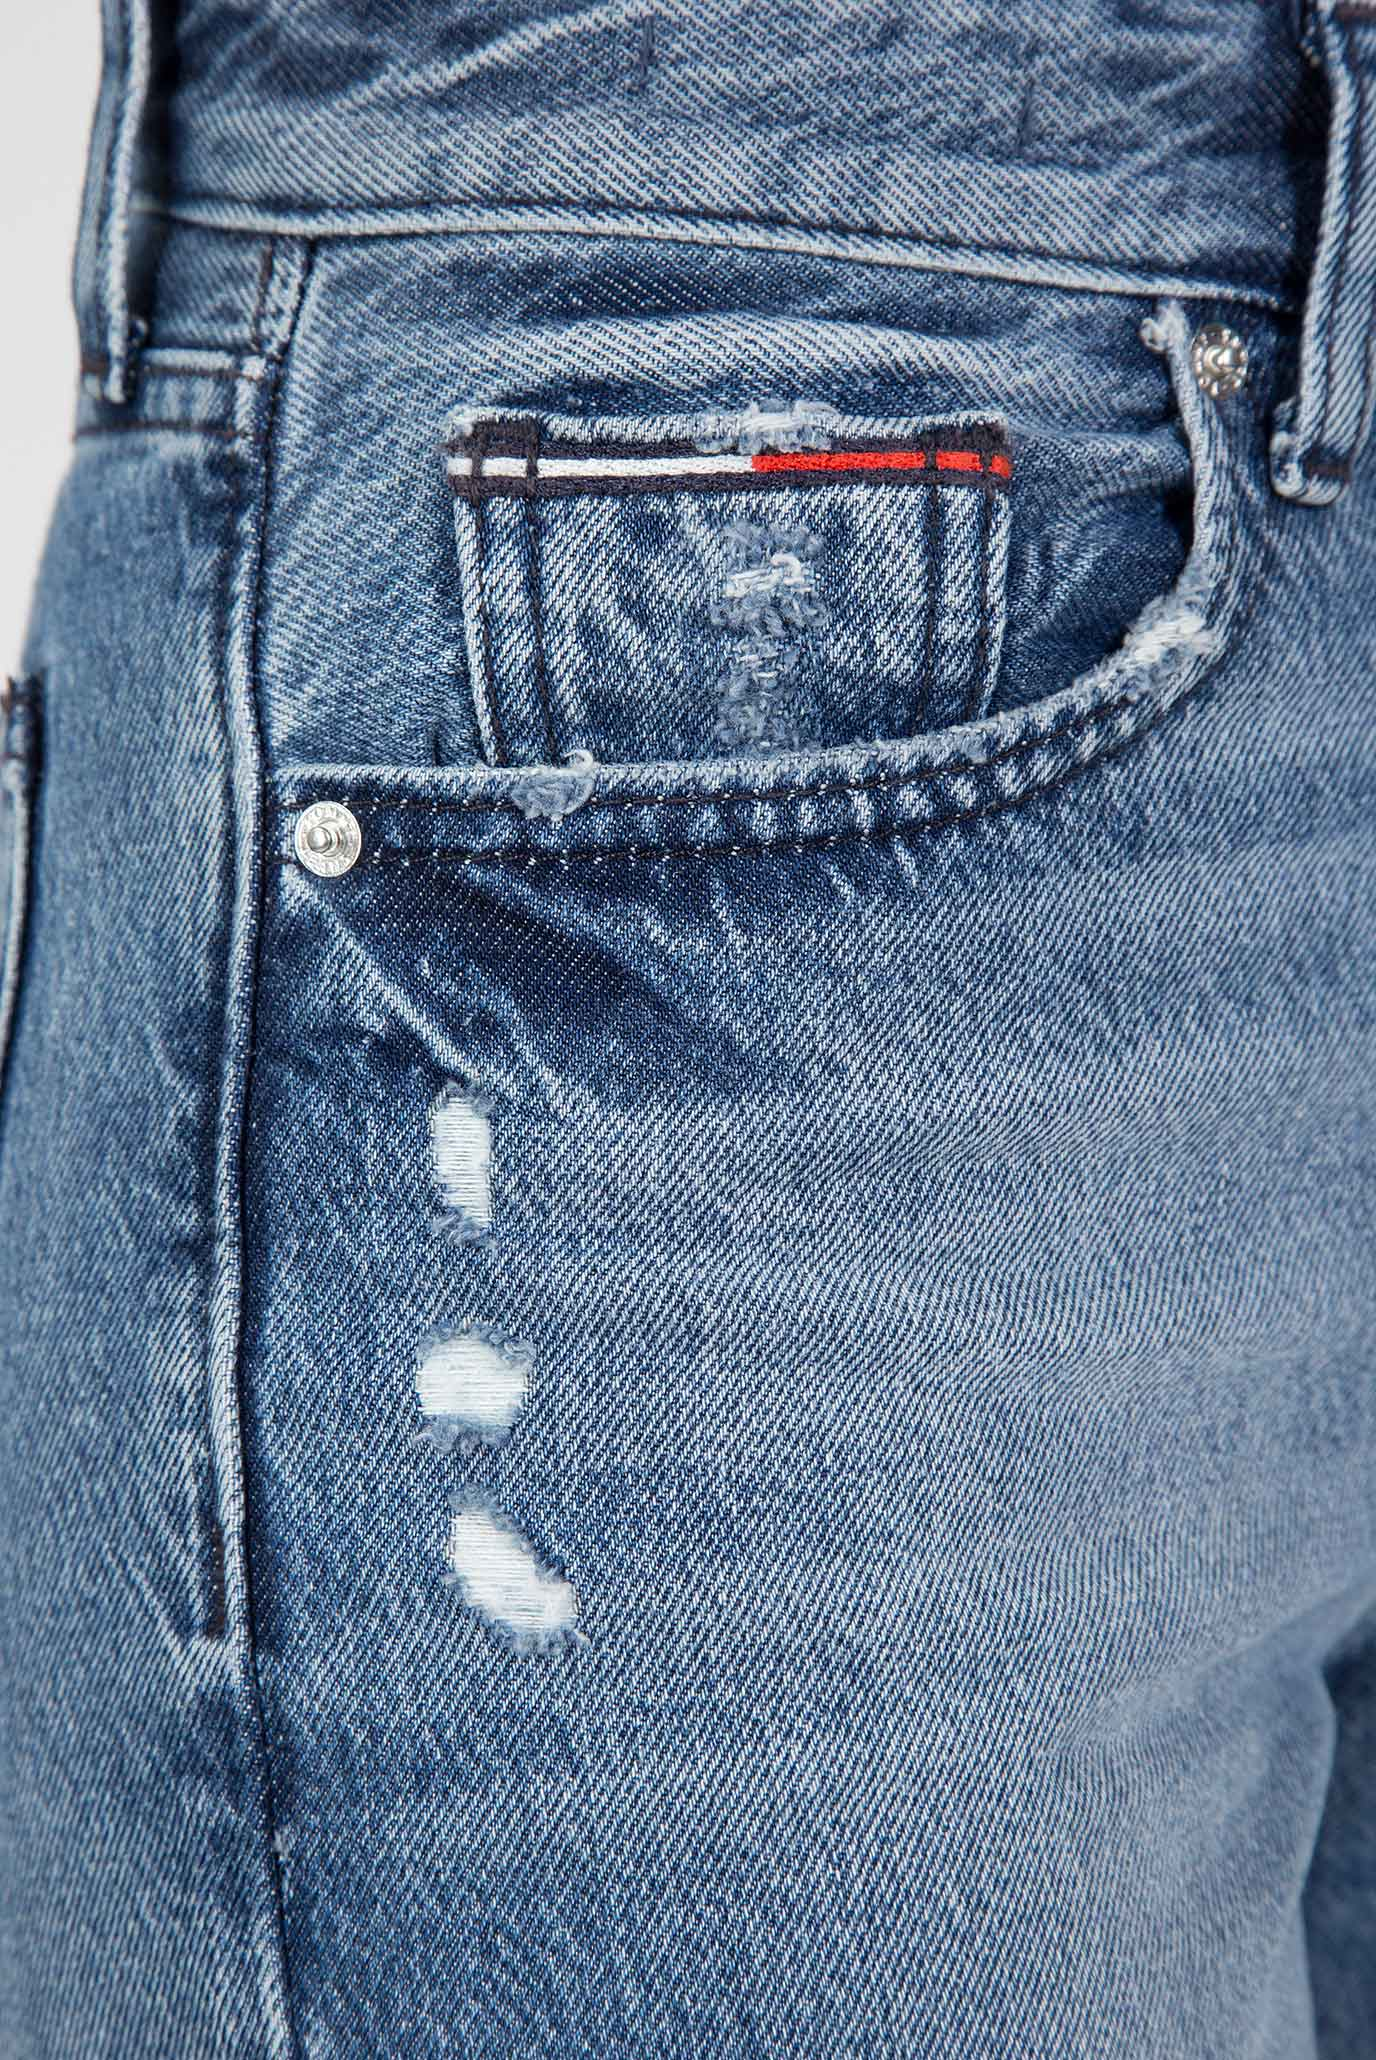 Купить Женские голубые джинсы High Rise Slim Cropped IZZY Tommy Hilfiger Tommy Hilfiger DW0DW05019 – Киев, Украина. Цены в интернет магазине MD Fashion